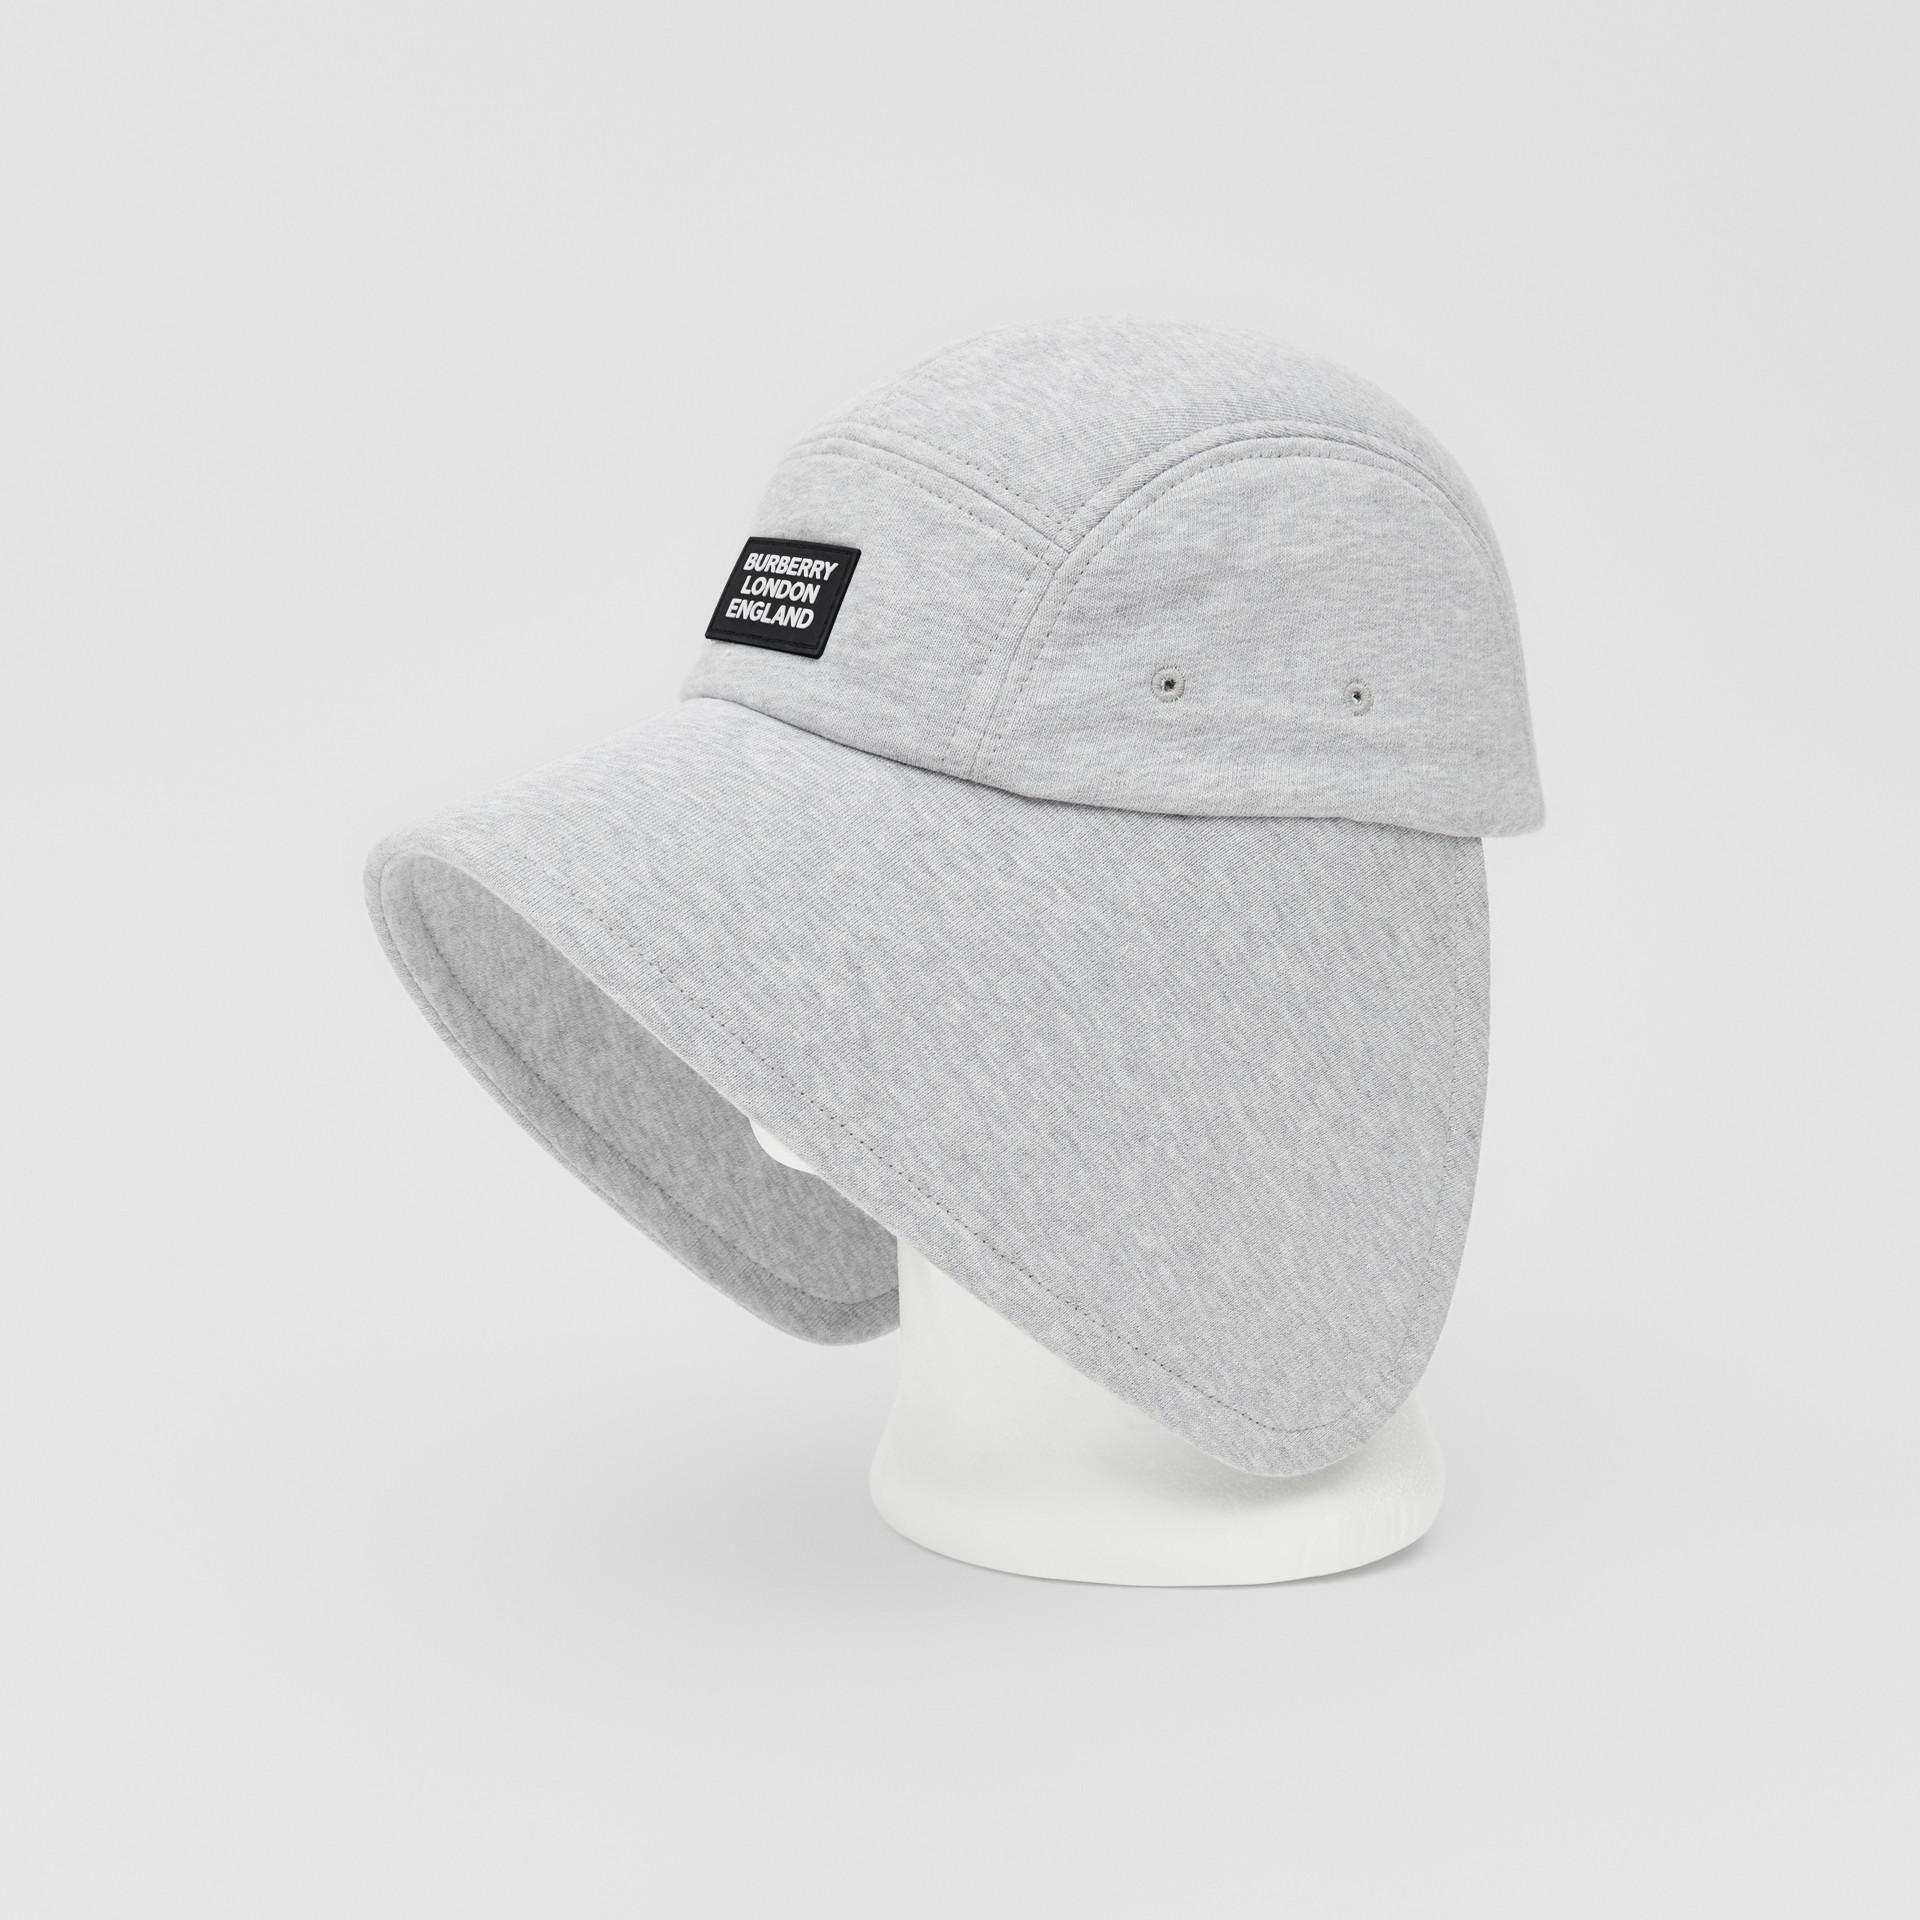 Logo Appliqué Cotton Jersey Bonnet Cap in Light Pebble Grey | Burberry - gallery image 4